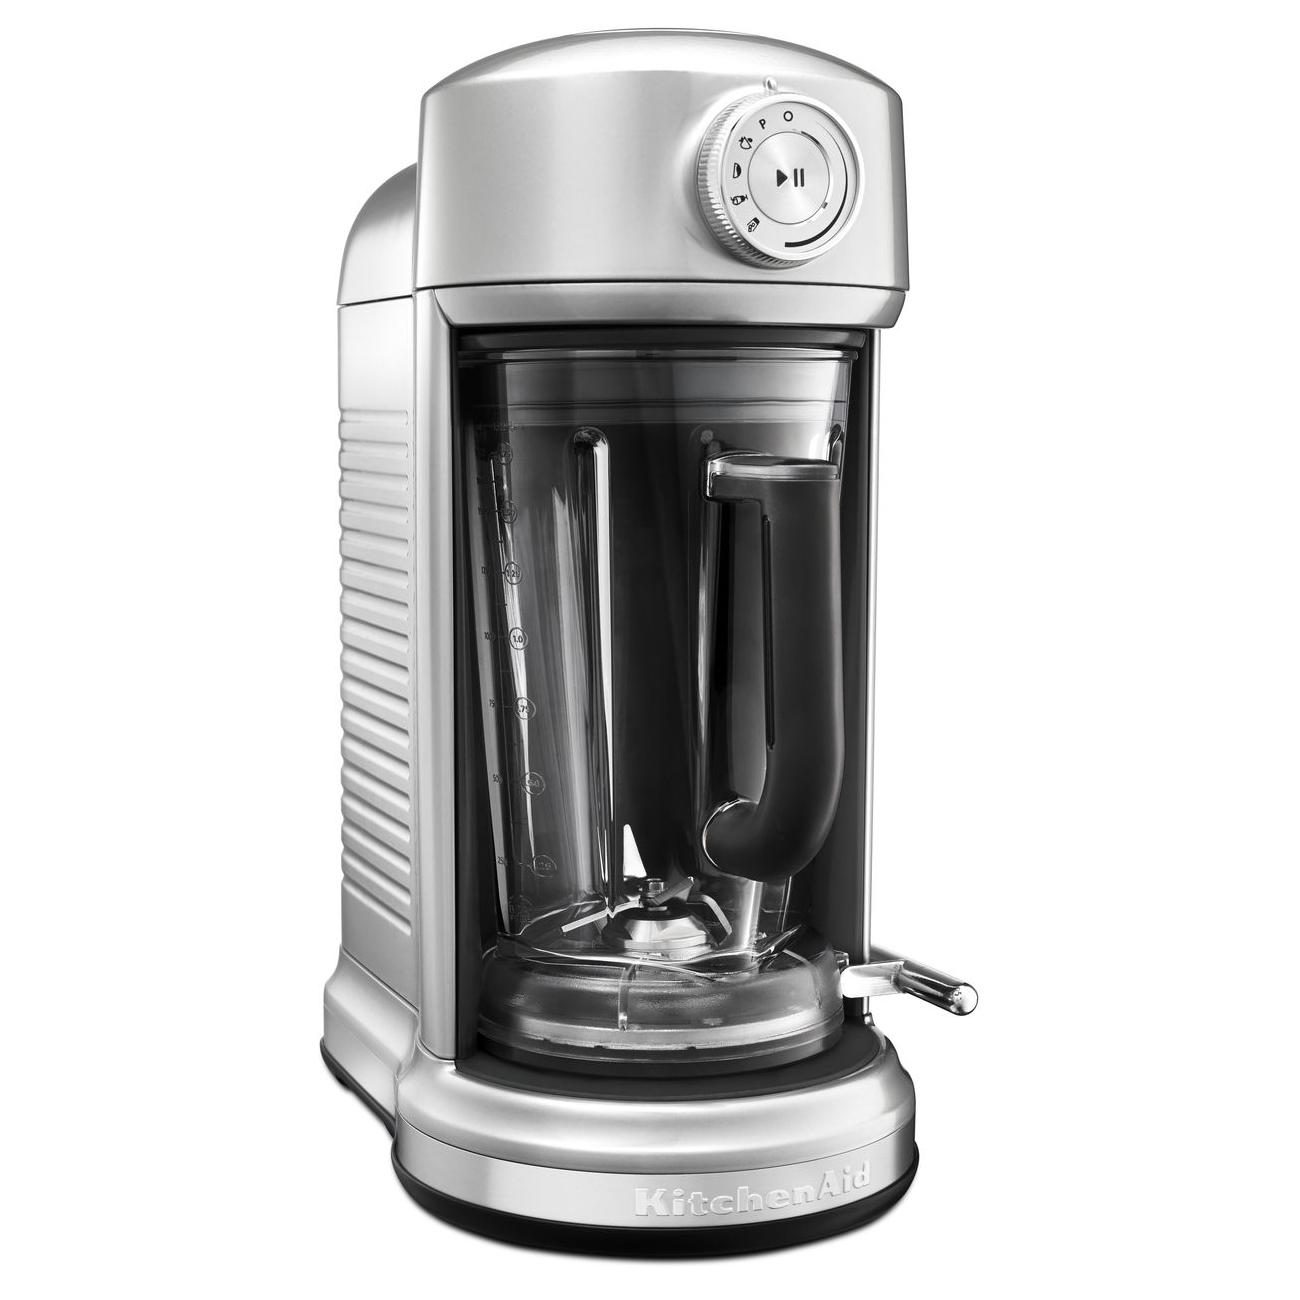 KitchenAid Torrent Sugar Pearl Silver Magnetic Drive Blender